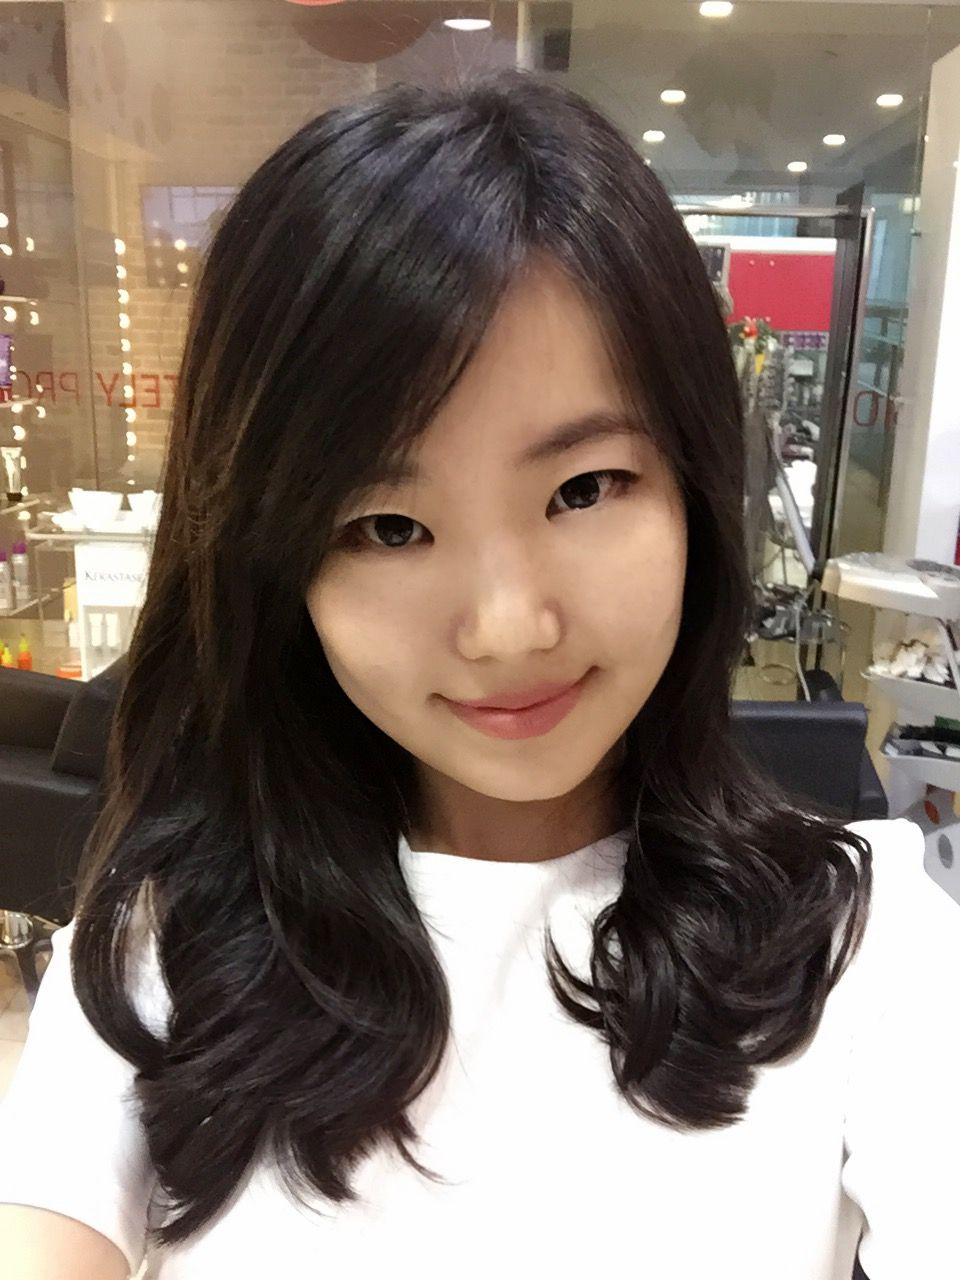 Straight perm yahoo answers - Korean Designer Perm Done By Korean Stylist Jade Lee Dusol Beauty Hair Salon Est